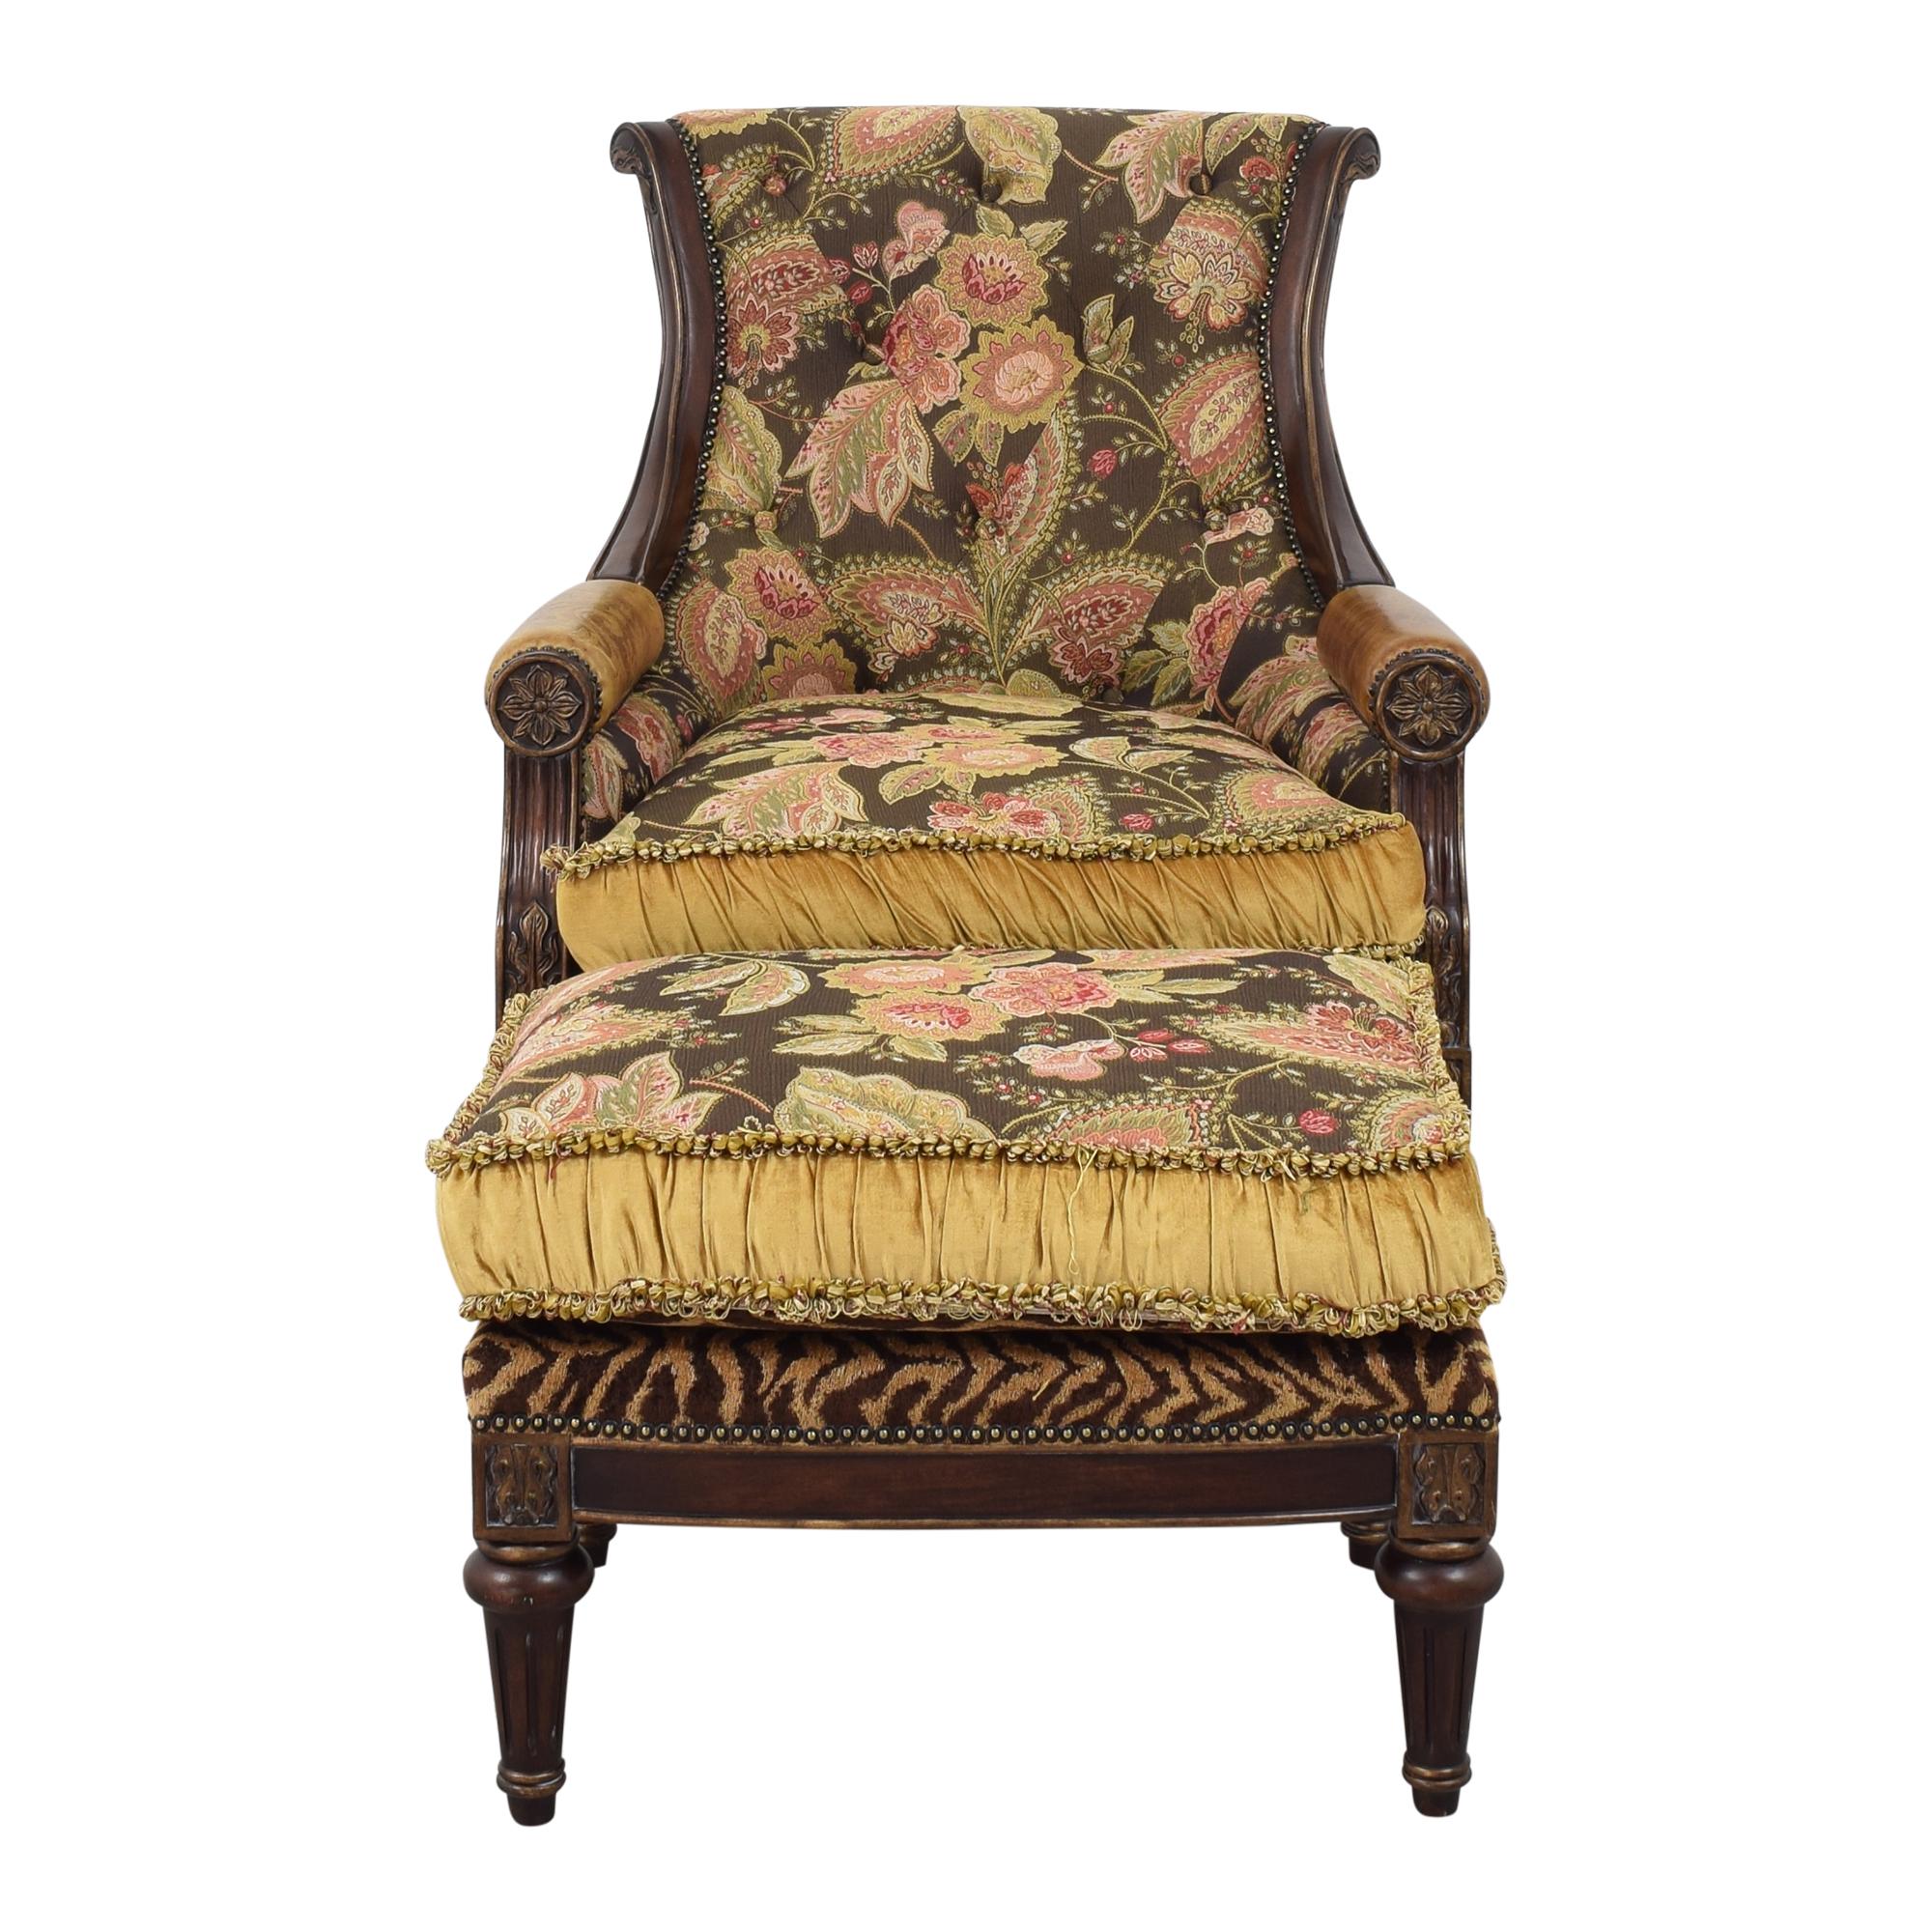 Jardine Enterprises Furniture Chair and Ottoman sale